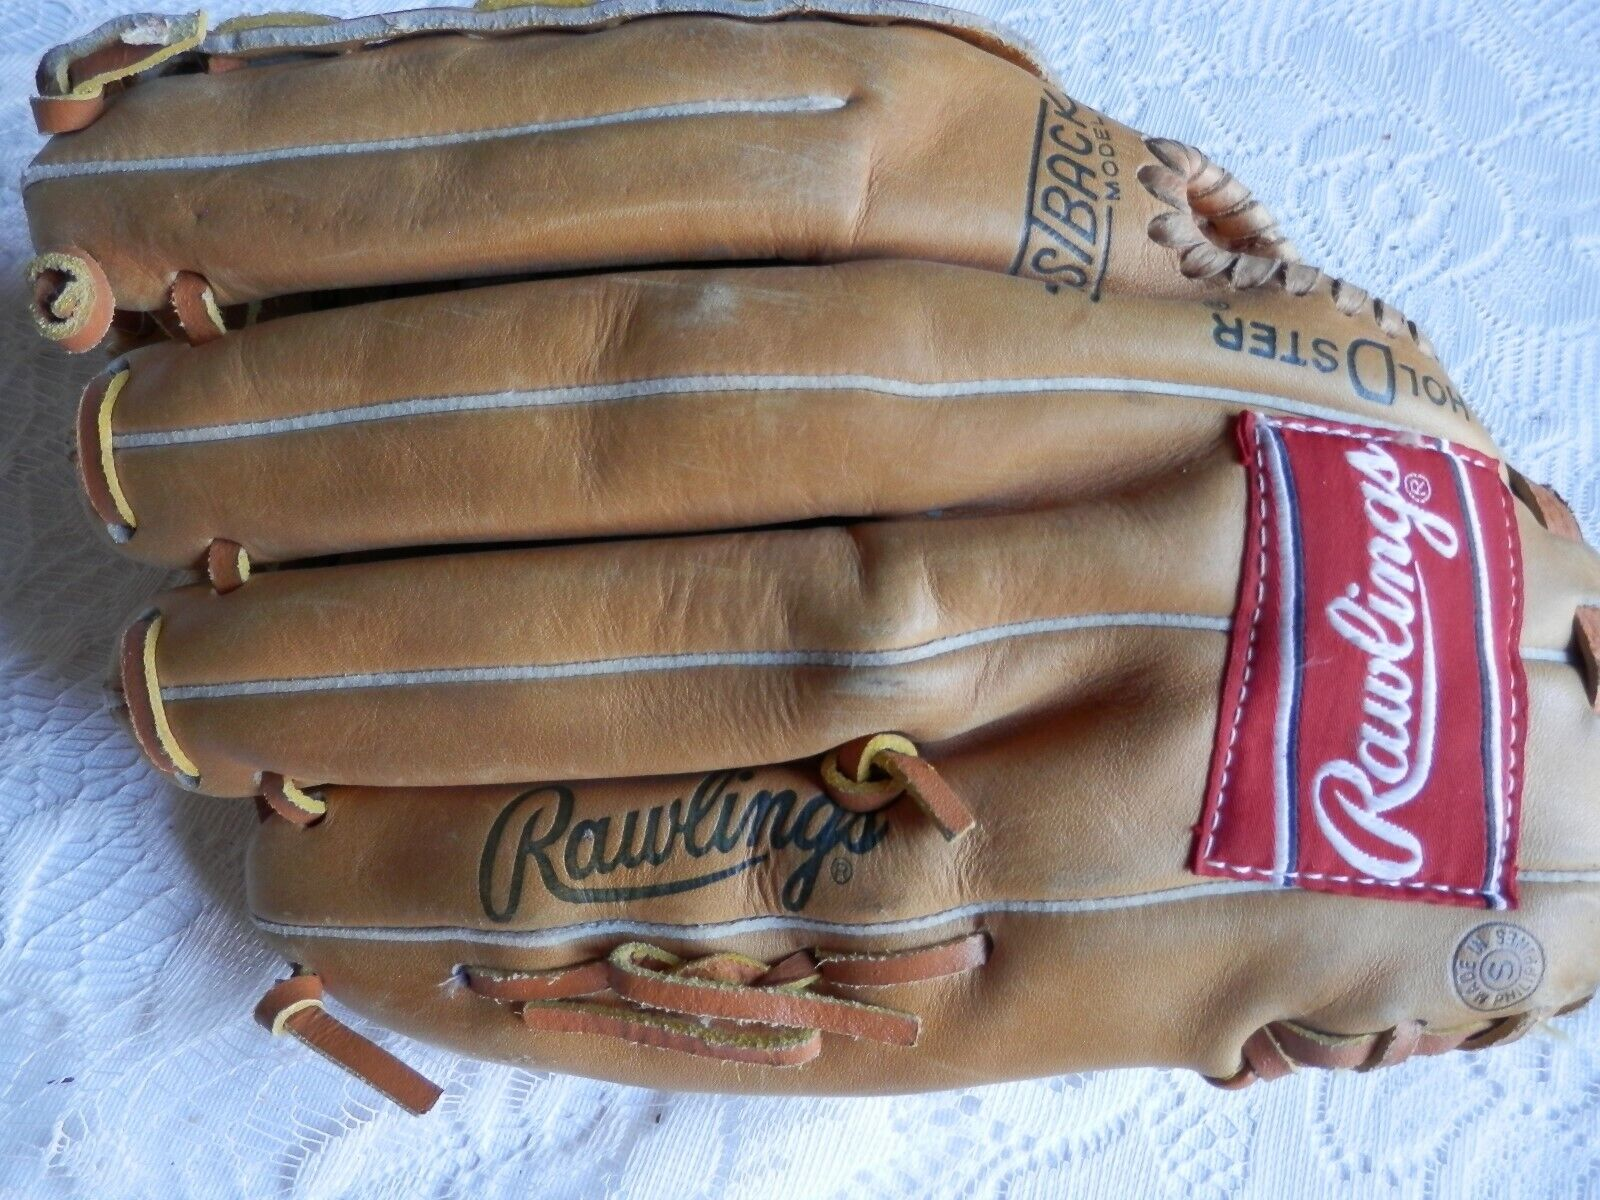 Rawlings de RBG 8 RHT béisbol guante de Softball 13 pulgadas